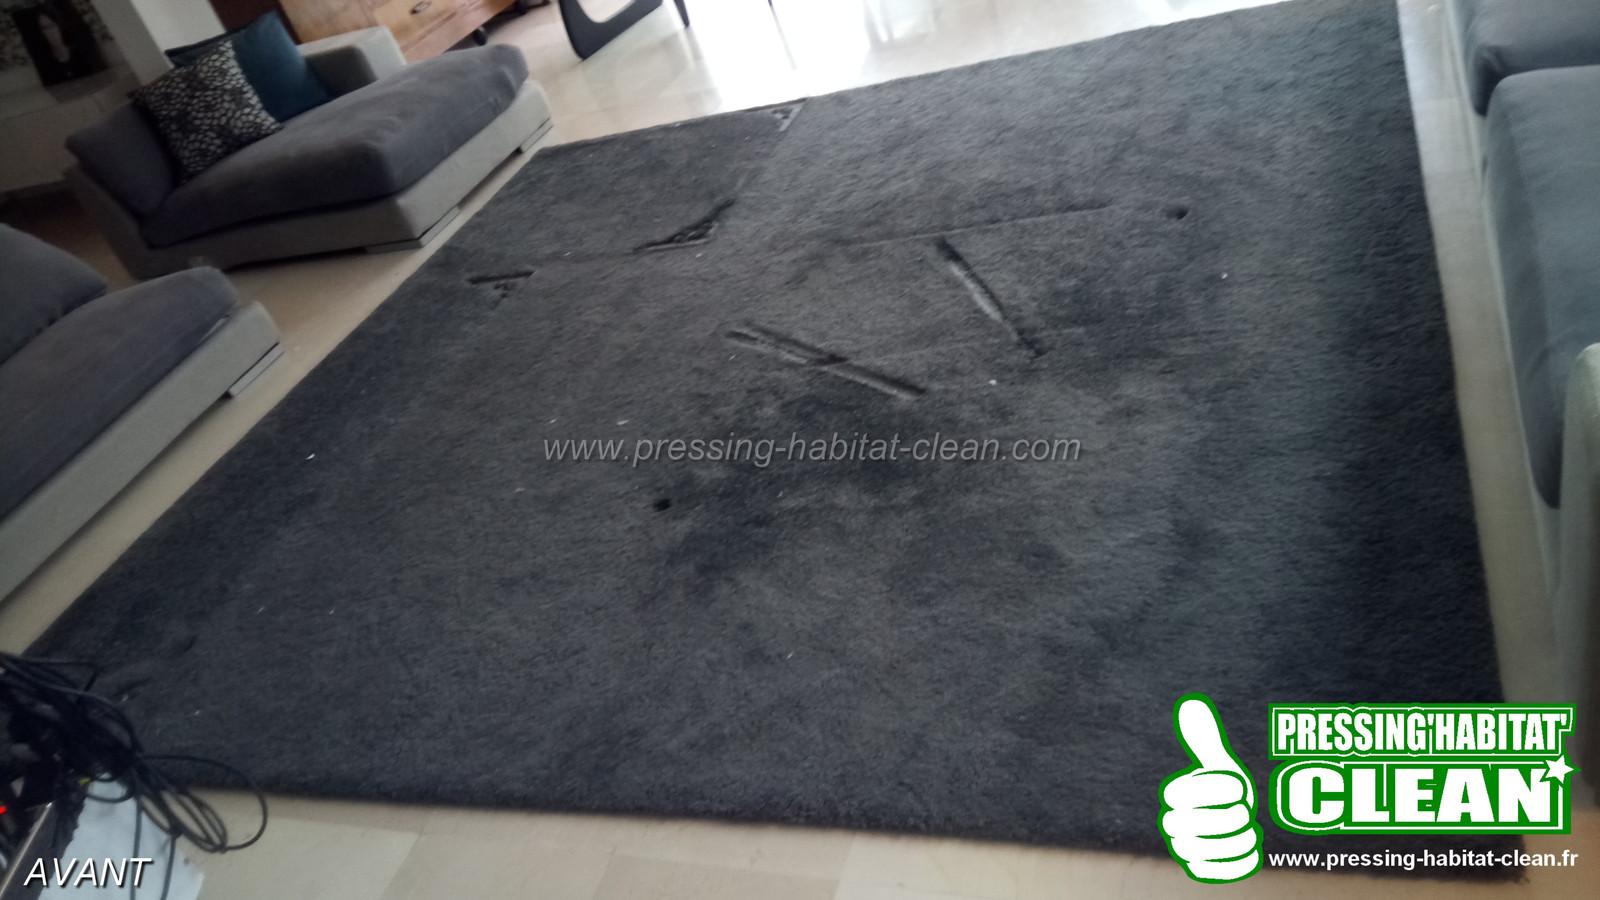 pressing habtat clean galerie photos r sultat avant apr s. Black Bedroom Furniture Sets. Home Design Ideas